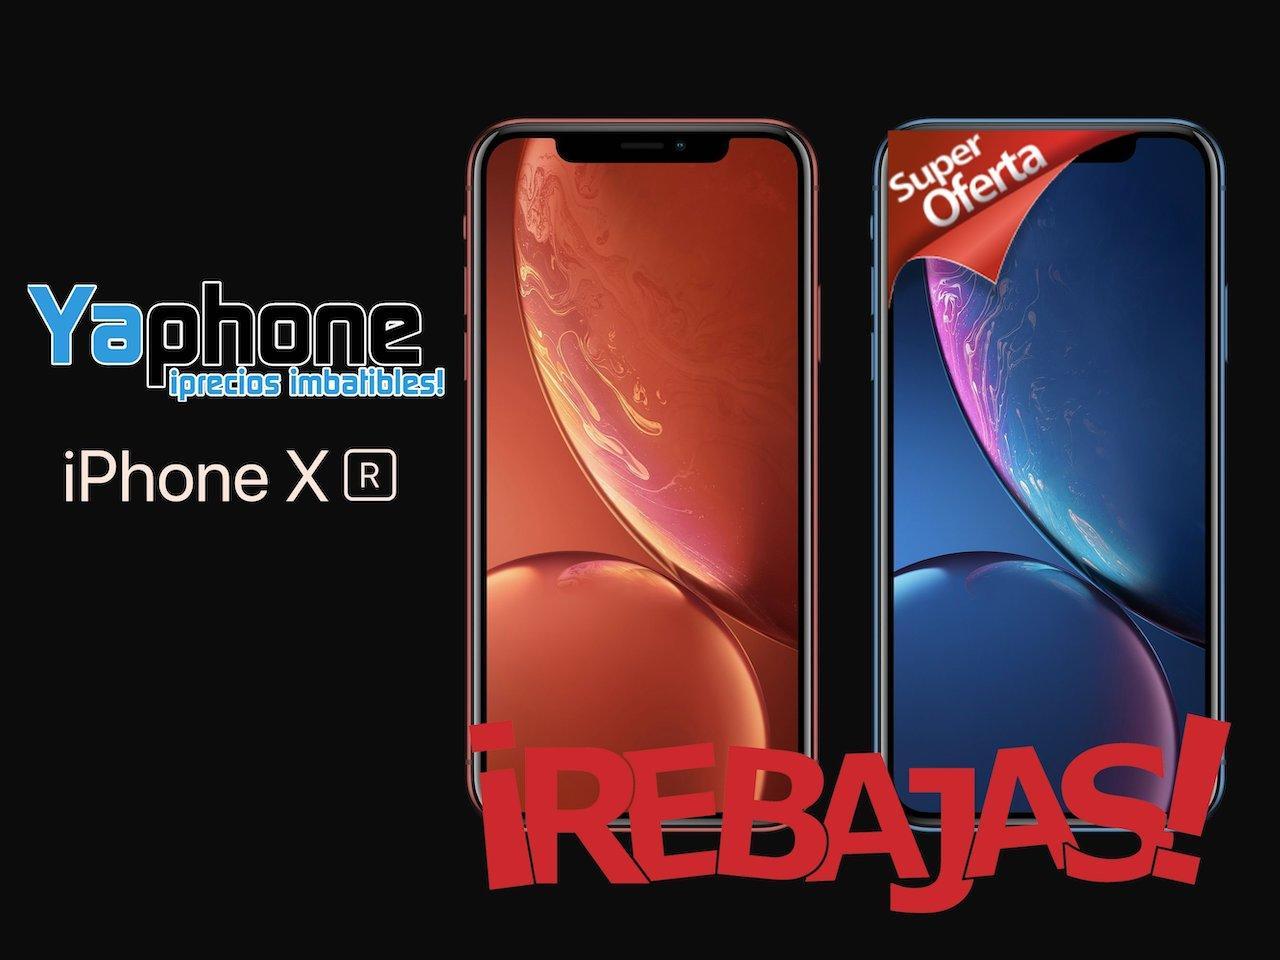 yaphone rebajas iPhone